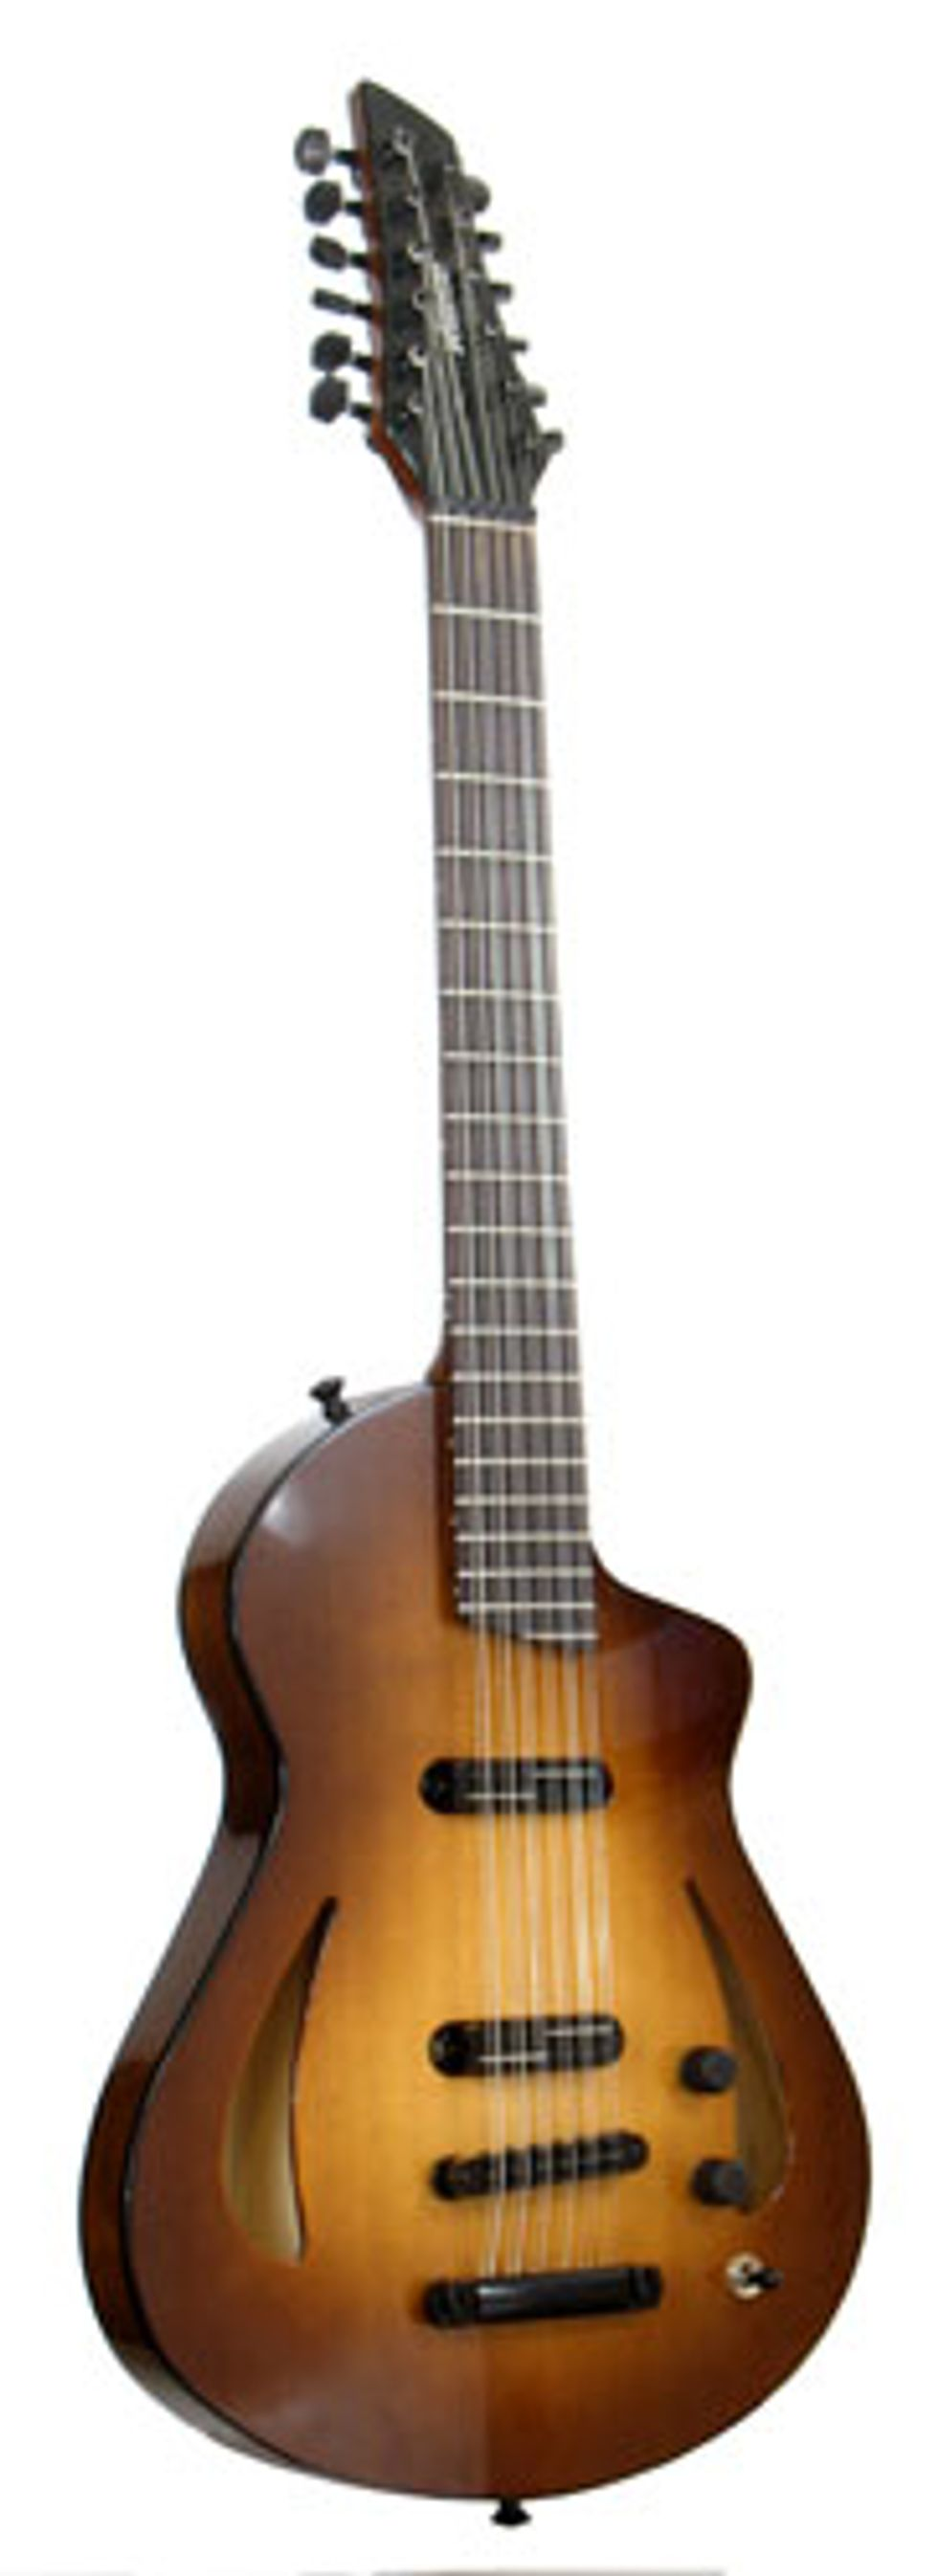 Veillette Guitars Unveils the AeroElectric True-Twelve 12-String